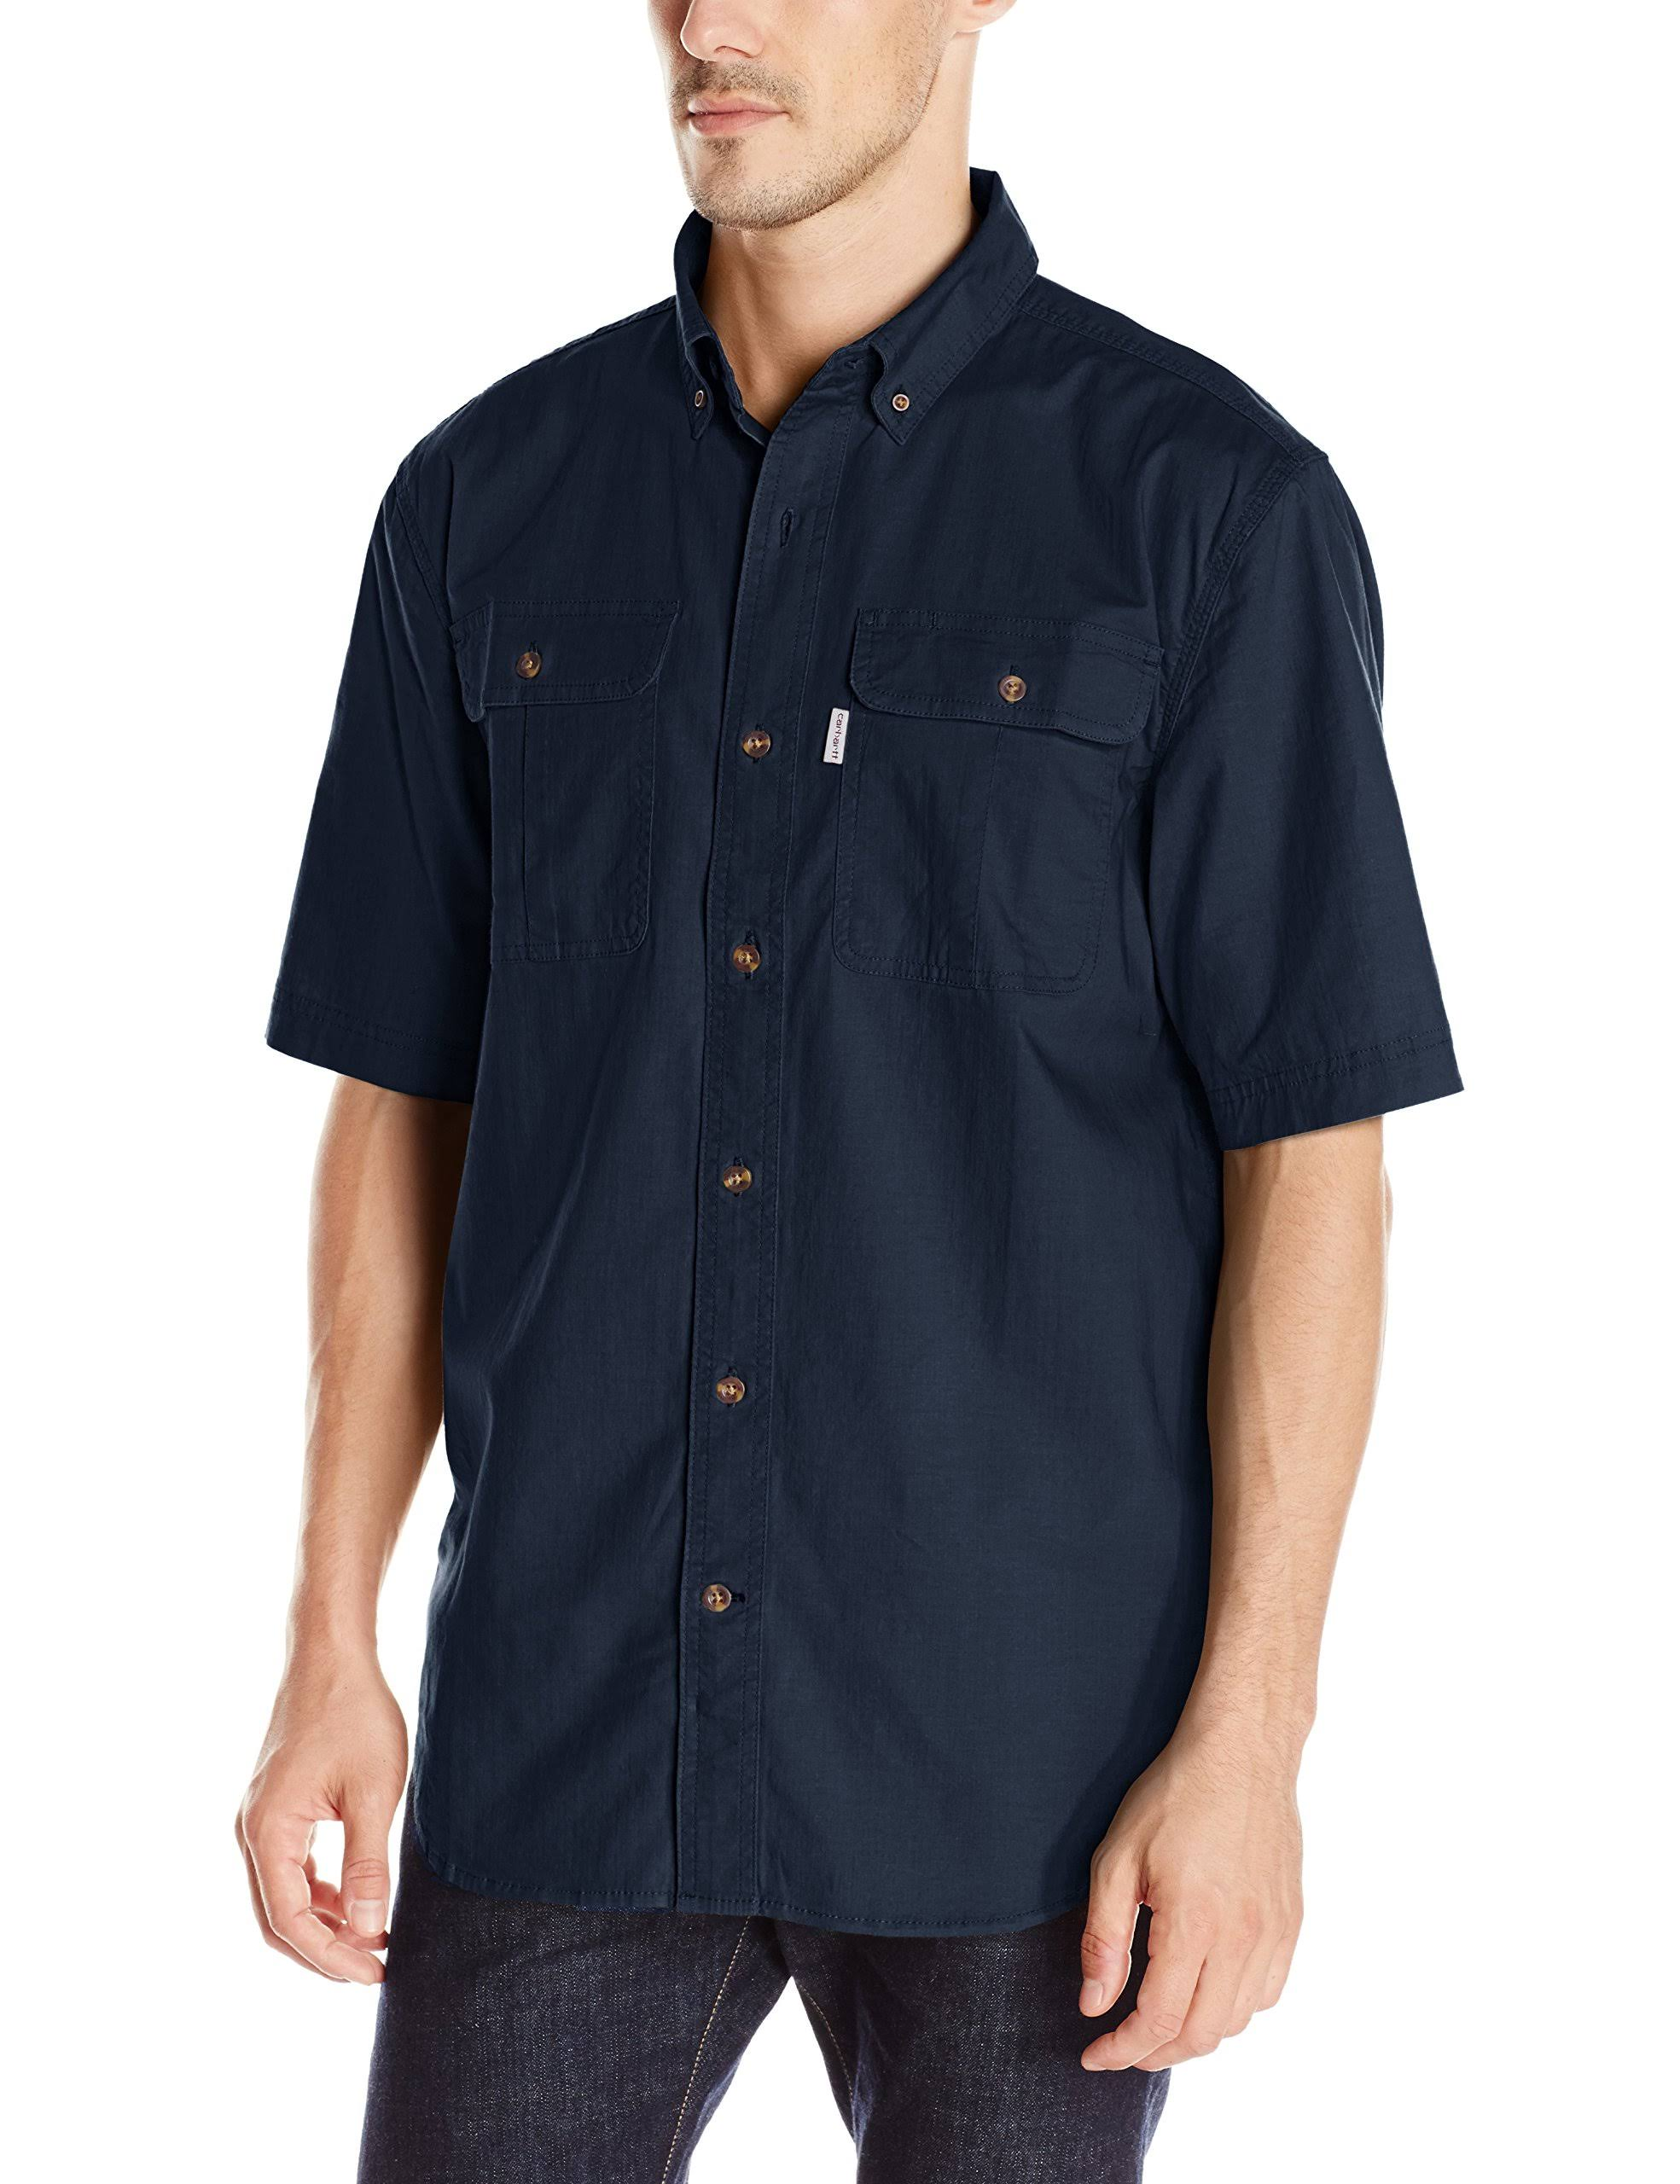 Azul Foreman Trabajo Camisas Corta Manga 101555 Carhartt Marino De a0BPTnq